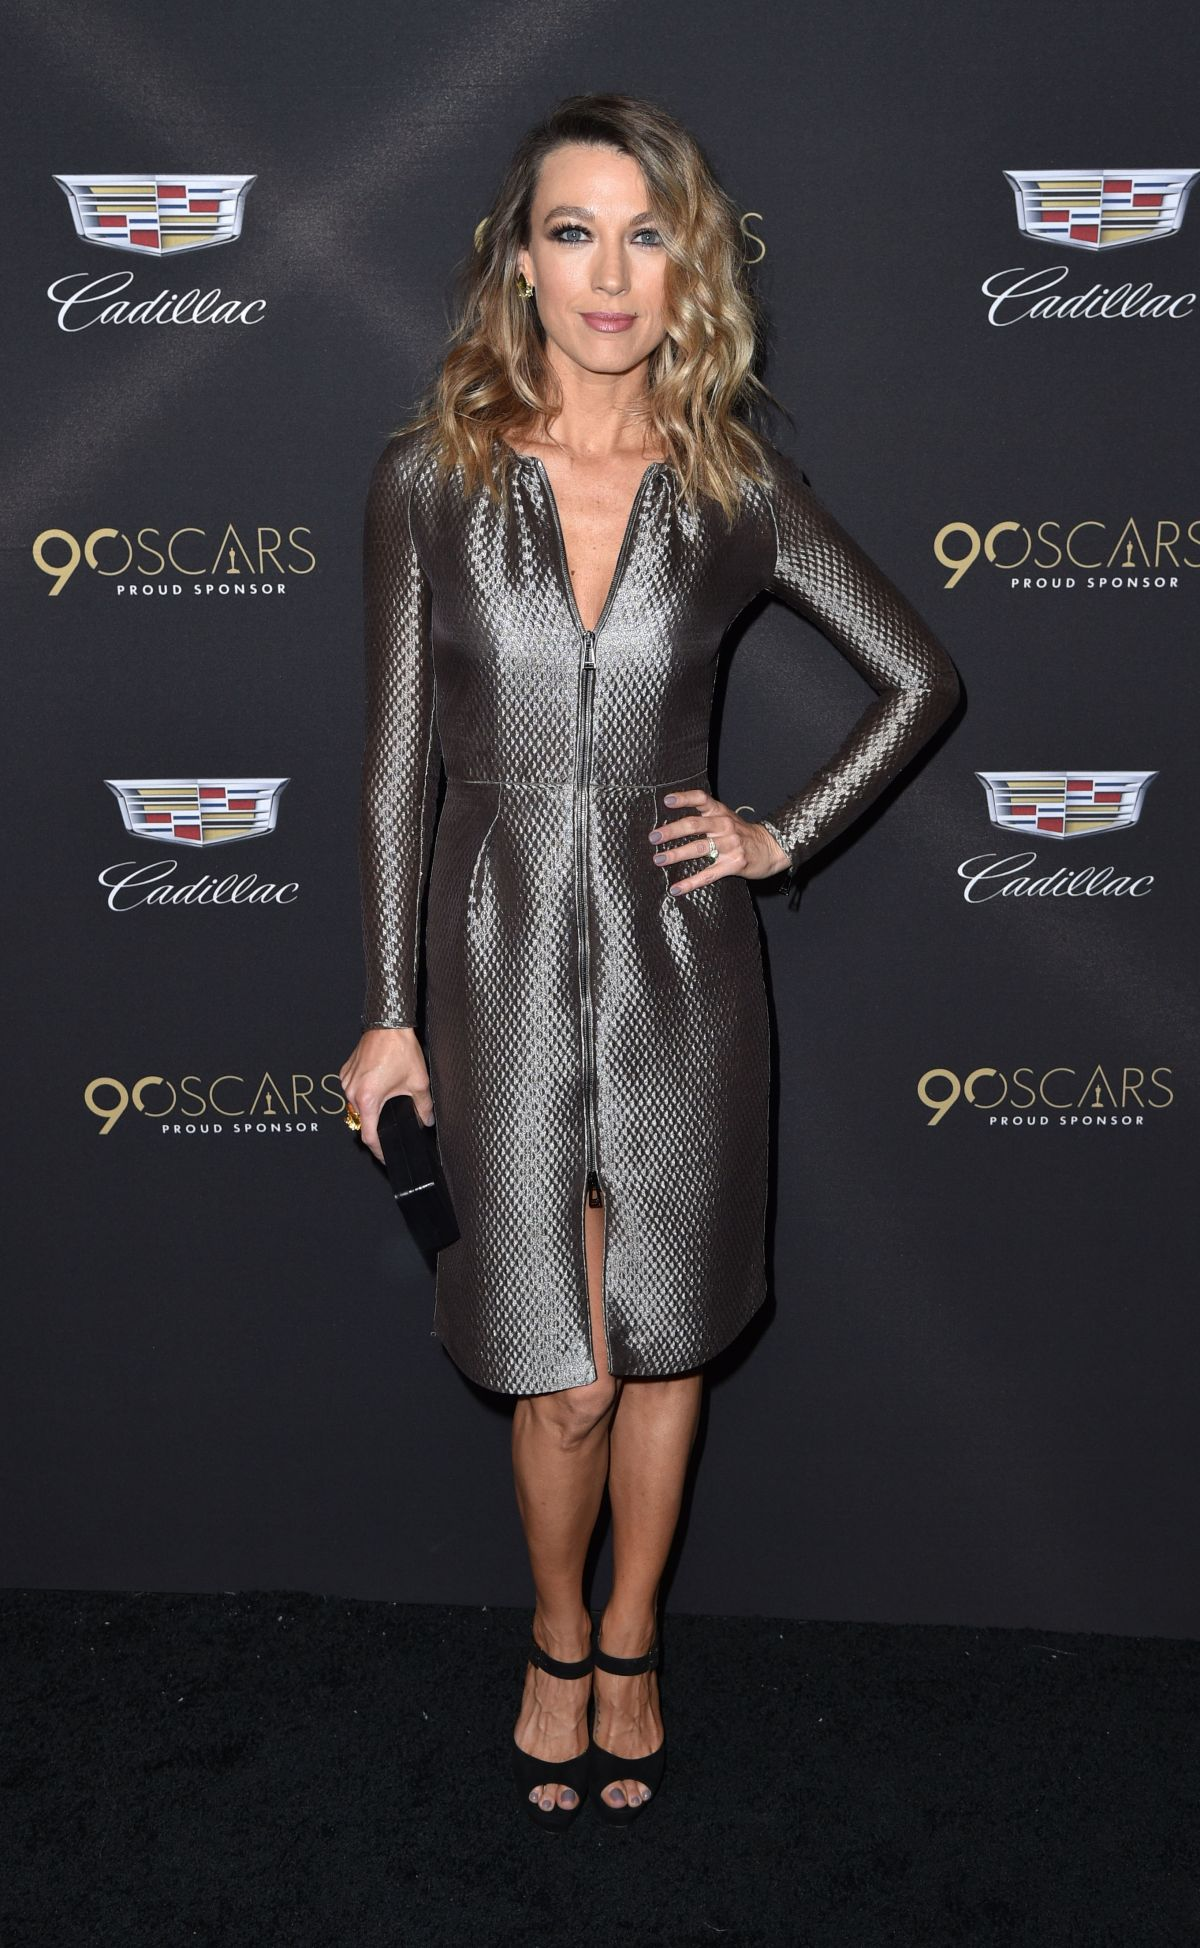 NATALIE ZEA at Cadillac Oscar Celebration in Los Angeles